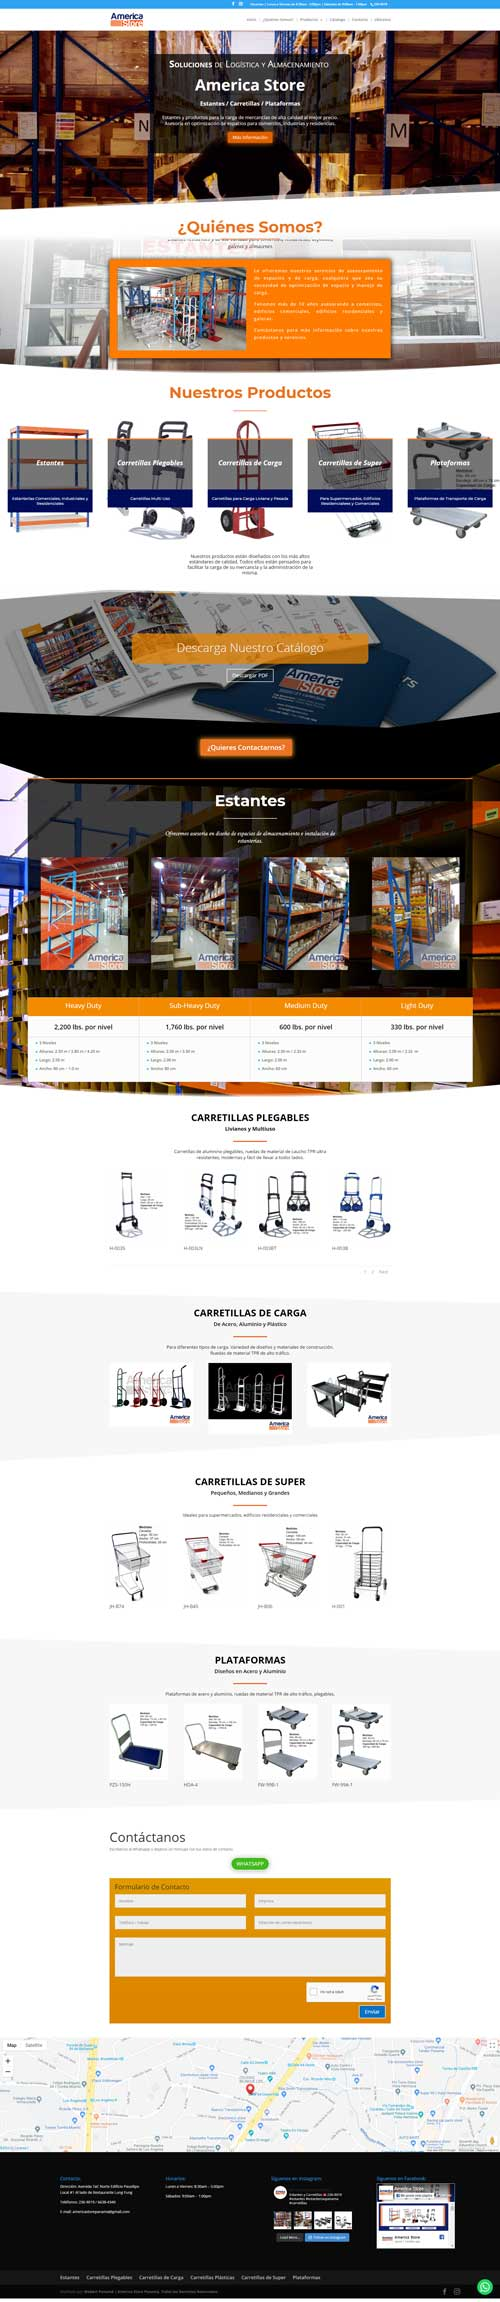 Diseño web Panamá, Diseño web Panamá